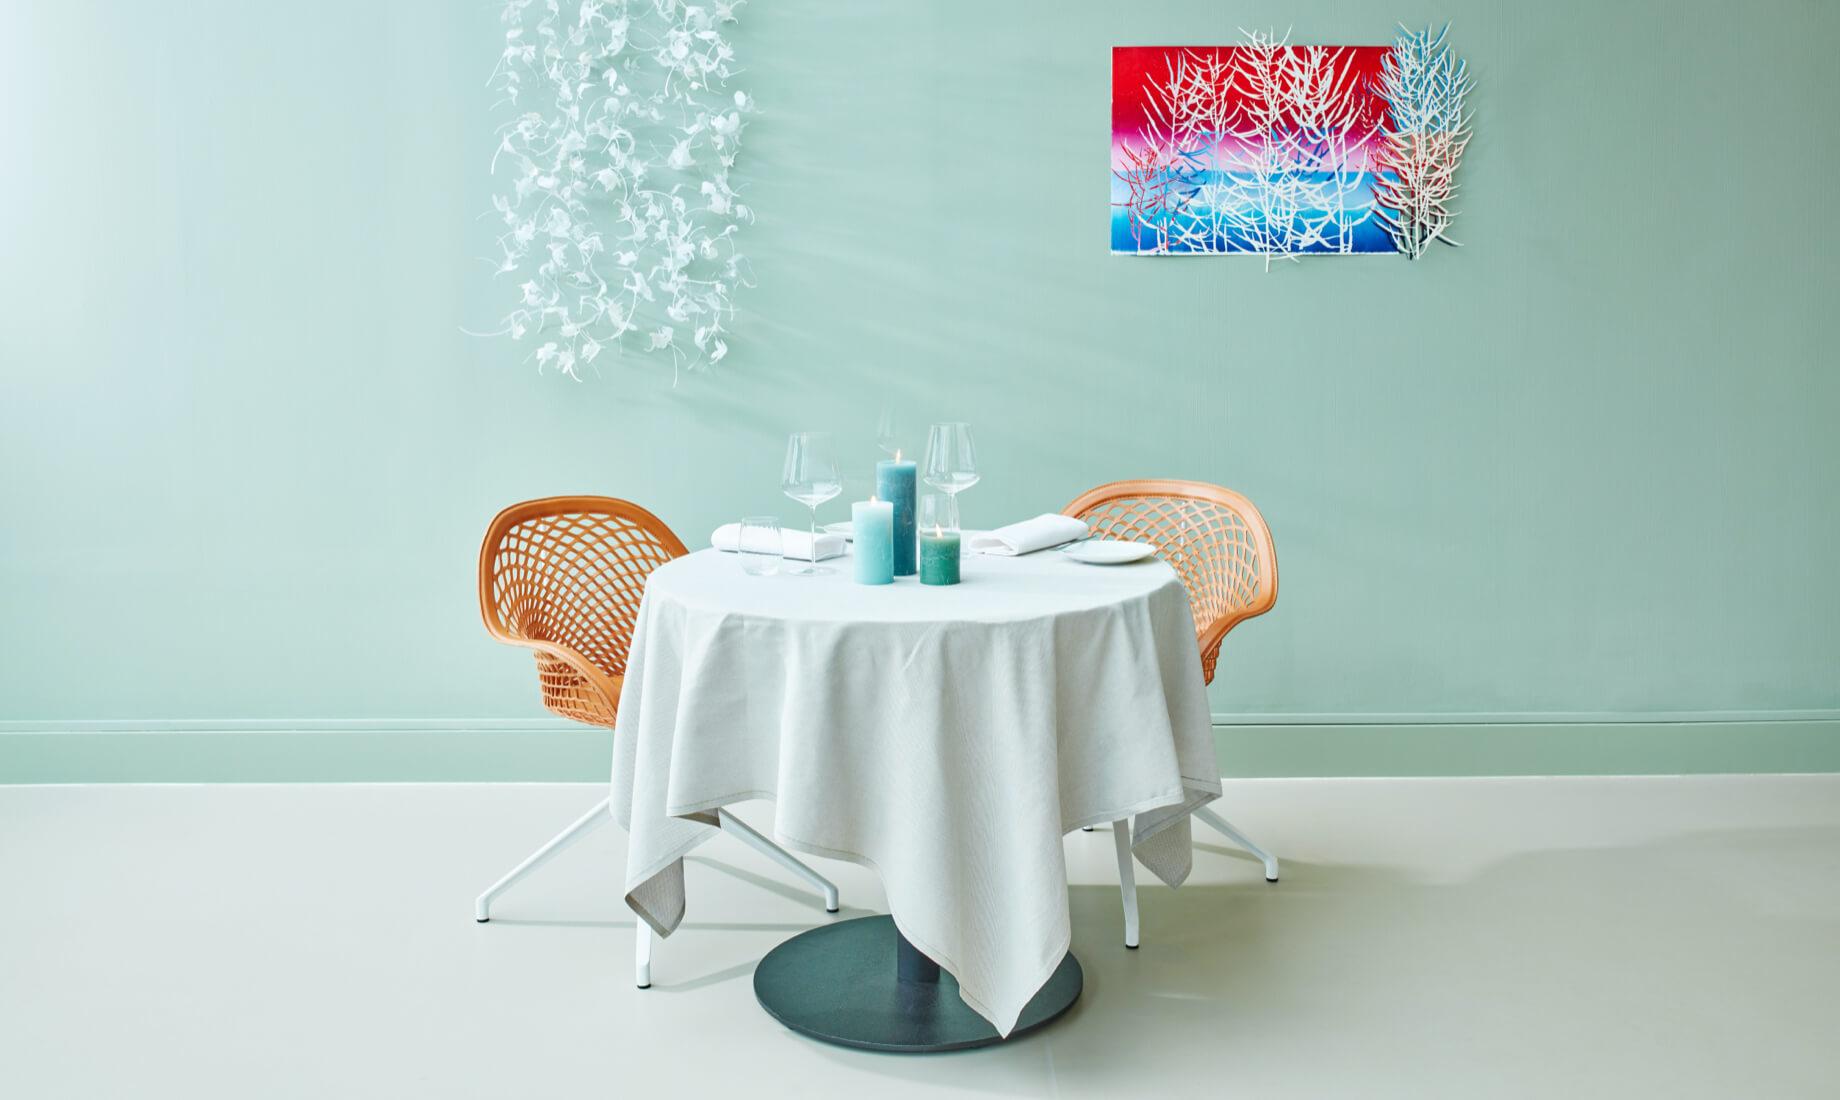 Arredamento ristorante design Bij Jef